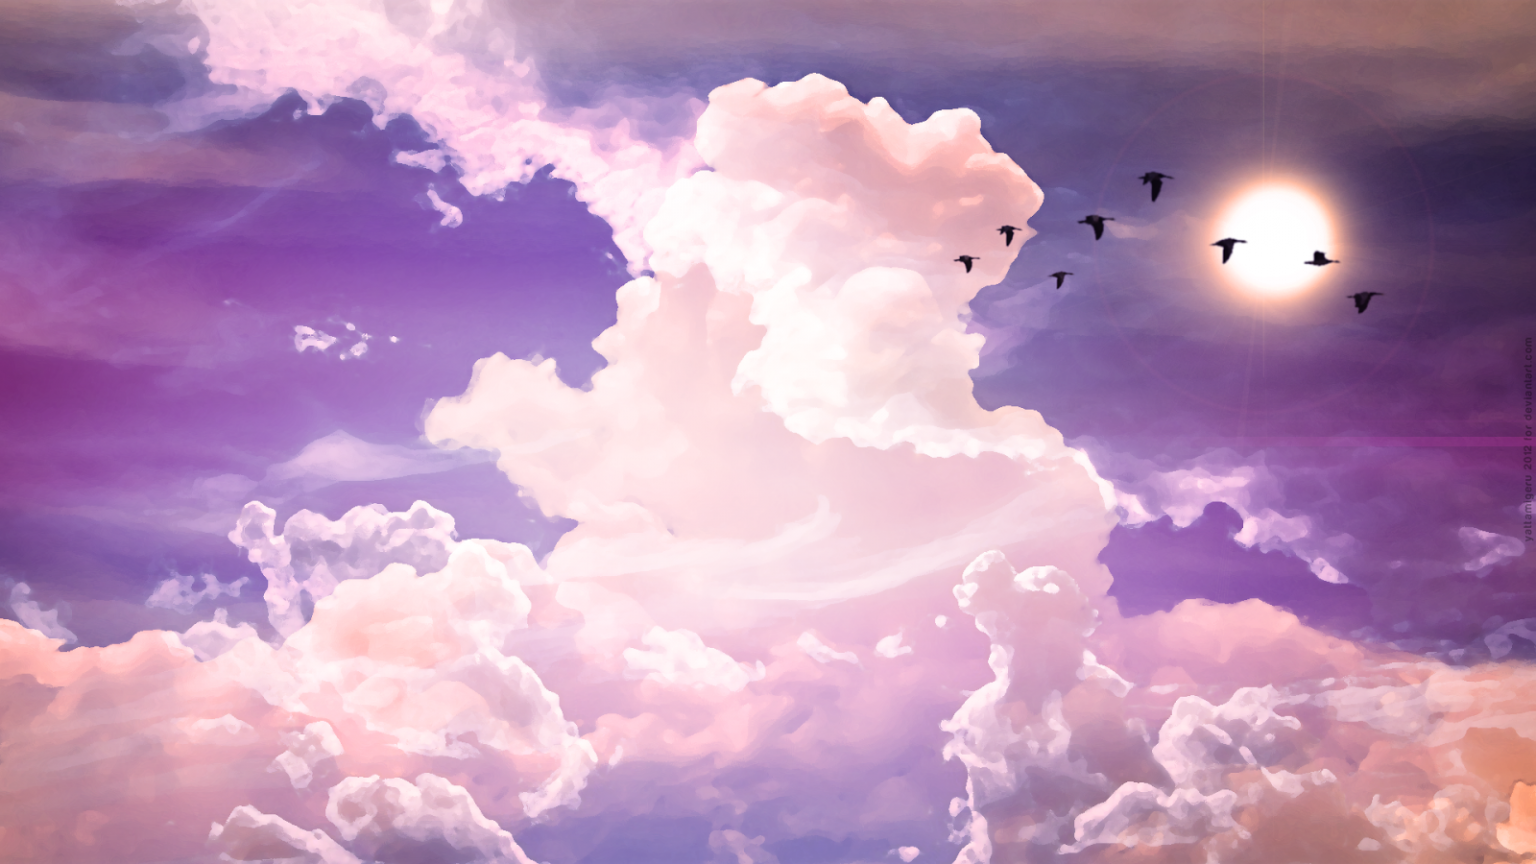 Pink Cloud Computer Wallpapers - Wallpaper Cave